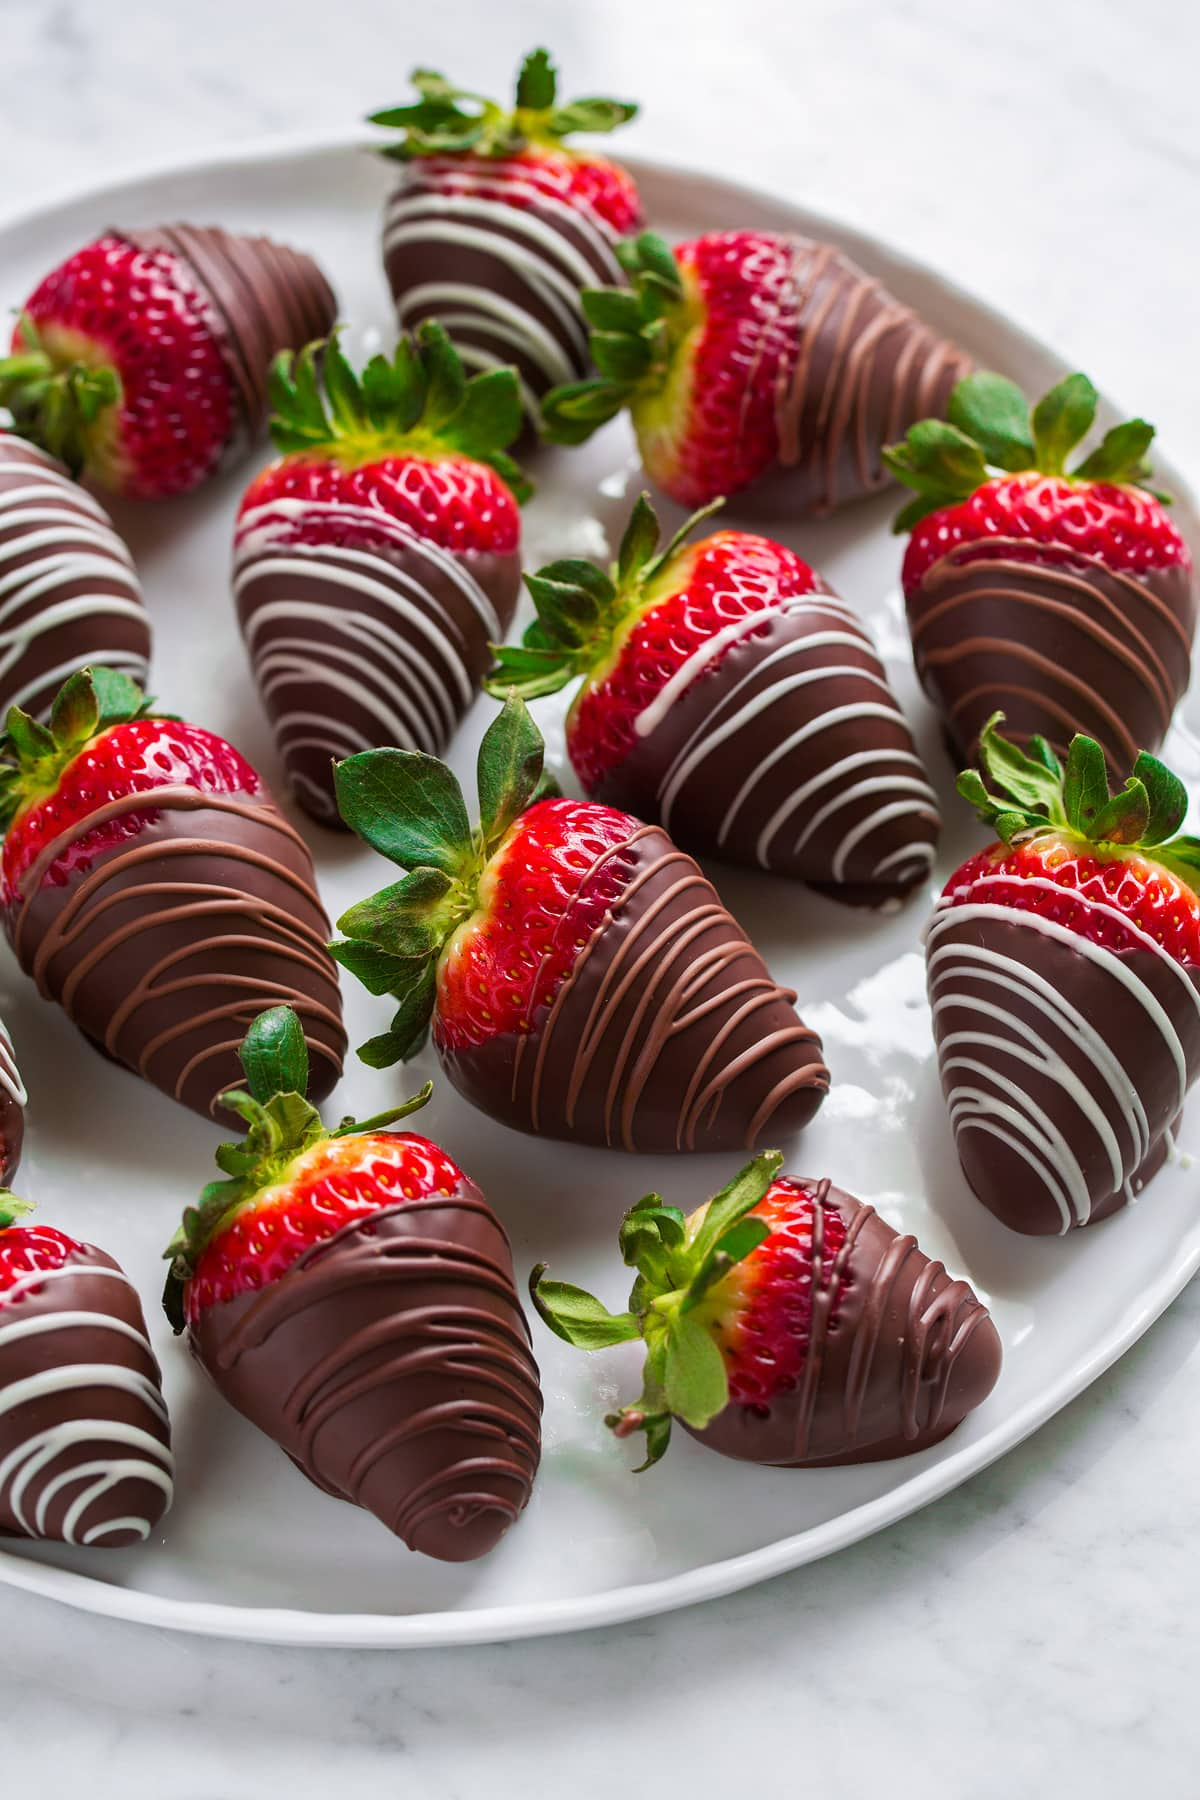 Chocolate Dipped Strawberries!